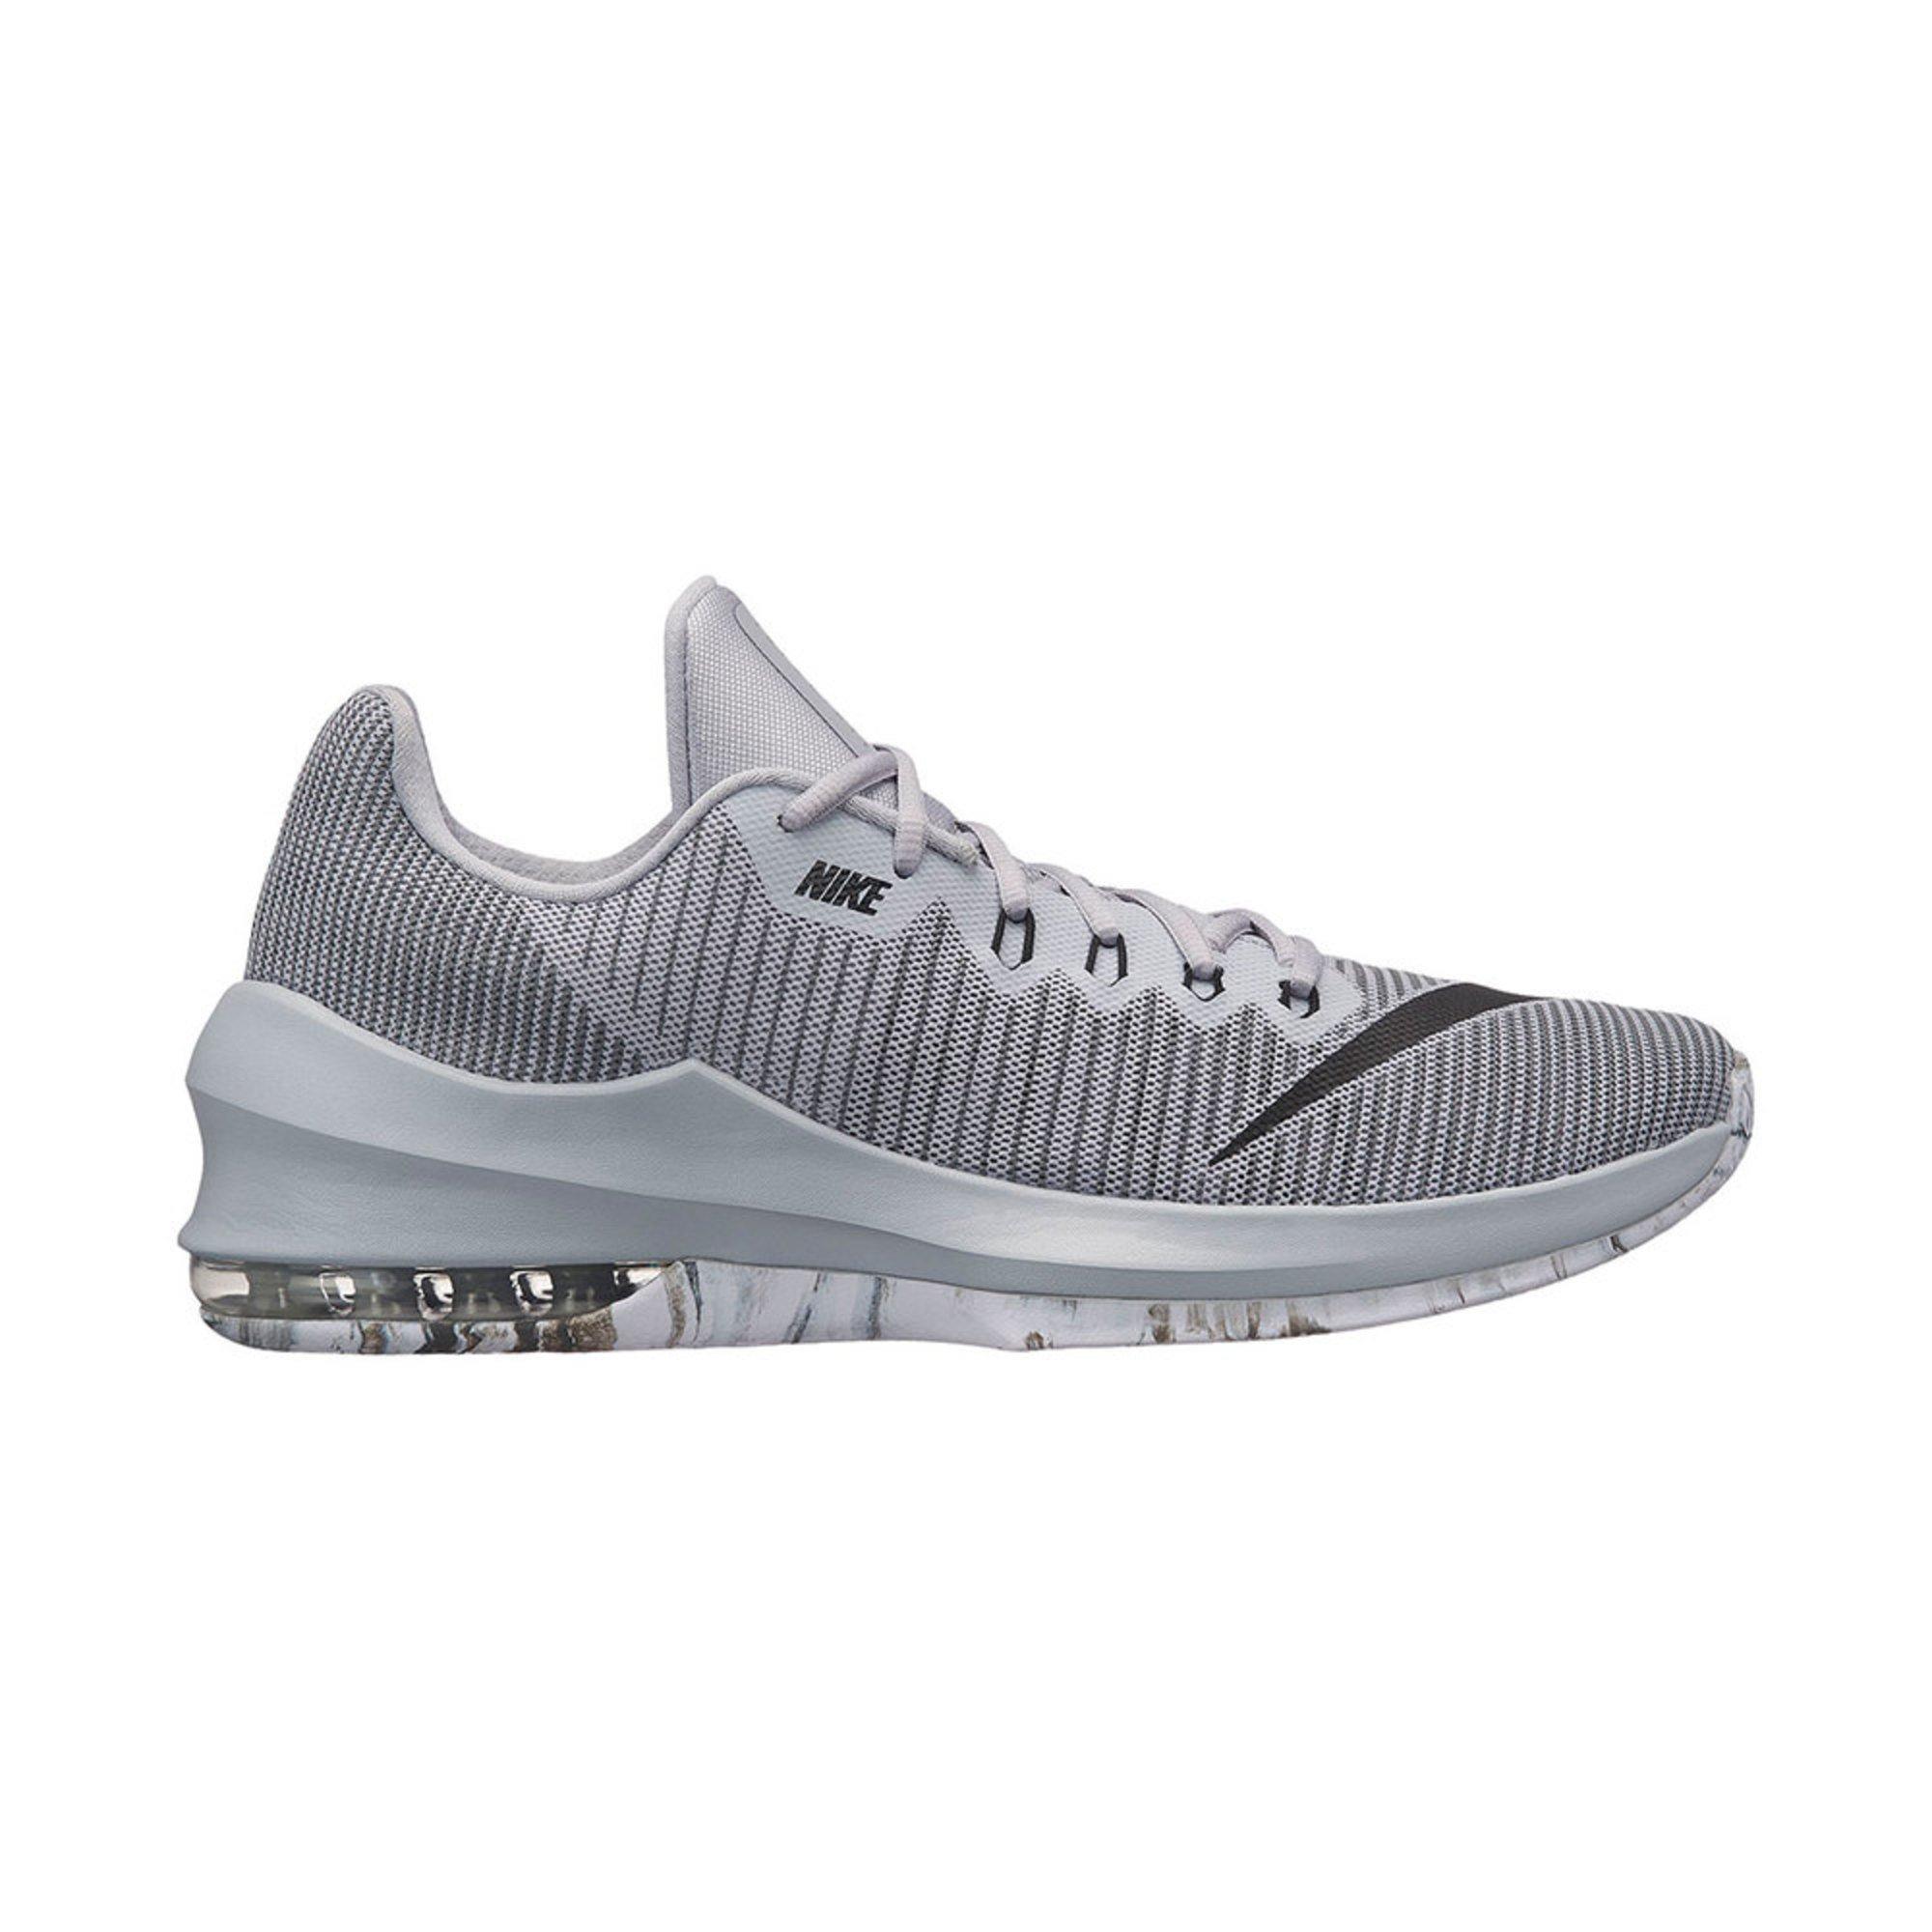 Nike Air Max Infuriate 2 Low Uomo Basketball scarpe scarpe Basketball   Uomo   6d2483